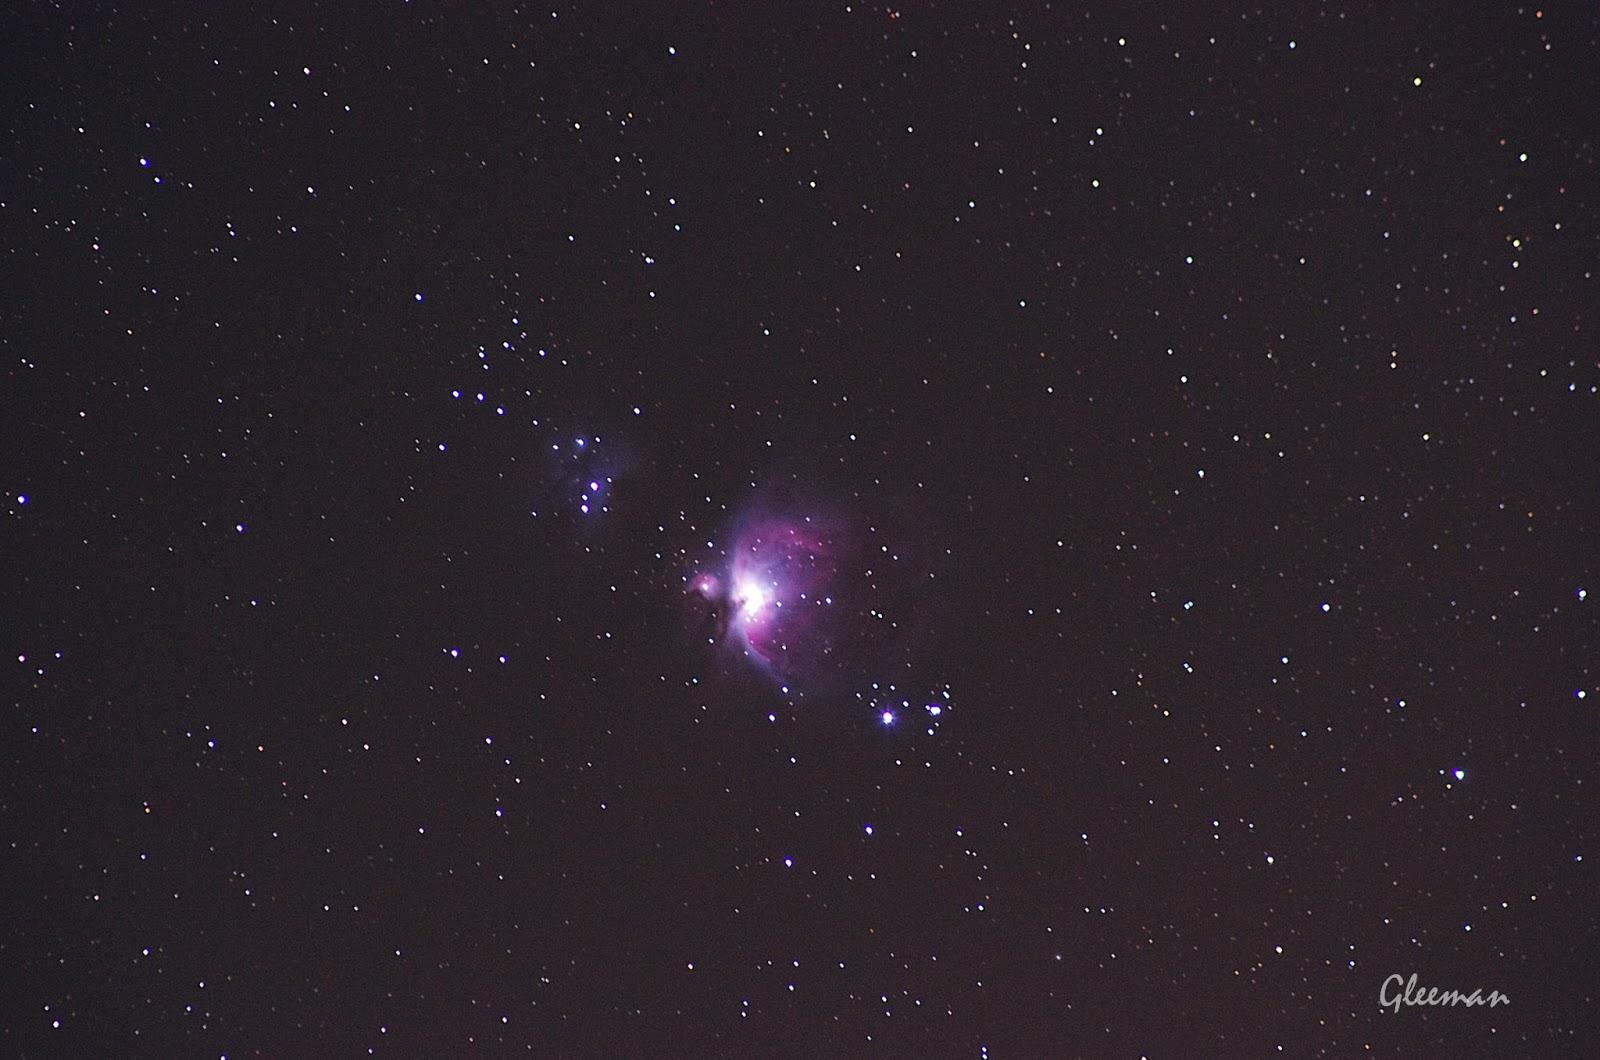 M42獵戶座大星雲 Pentax K5 + O-GPS1 + Tamron Adaptall-2 SP 300mm f/2.8 LD IF (60B) , ISO 1600, F2.8 40sec